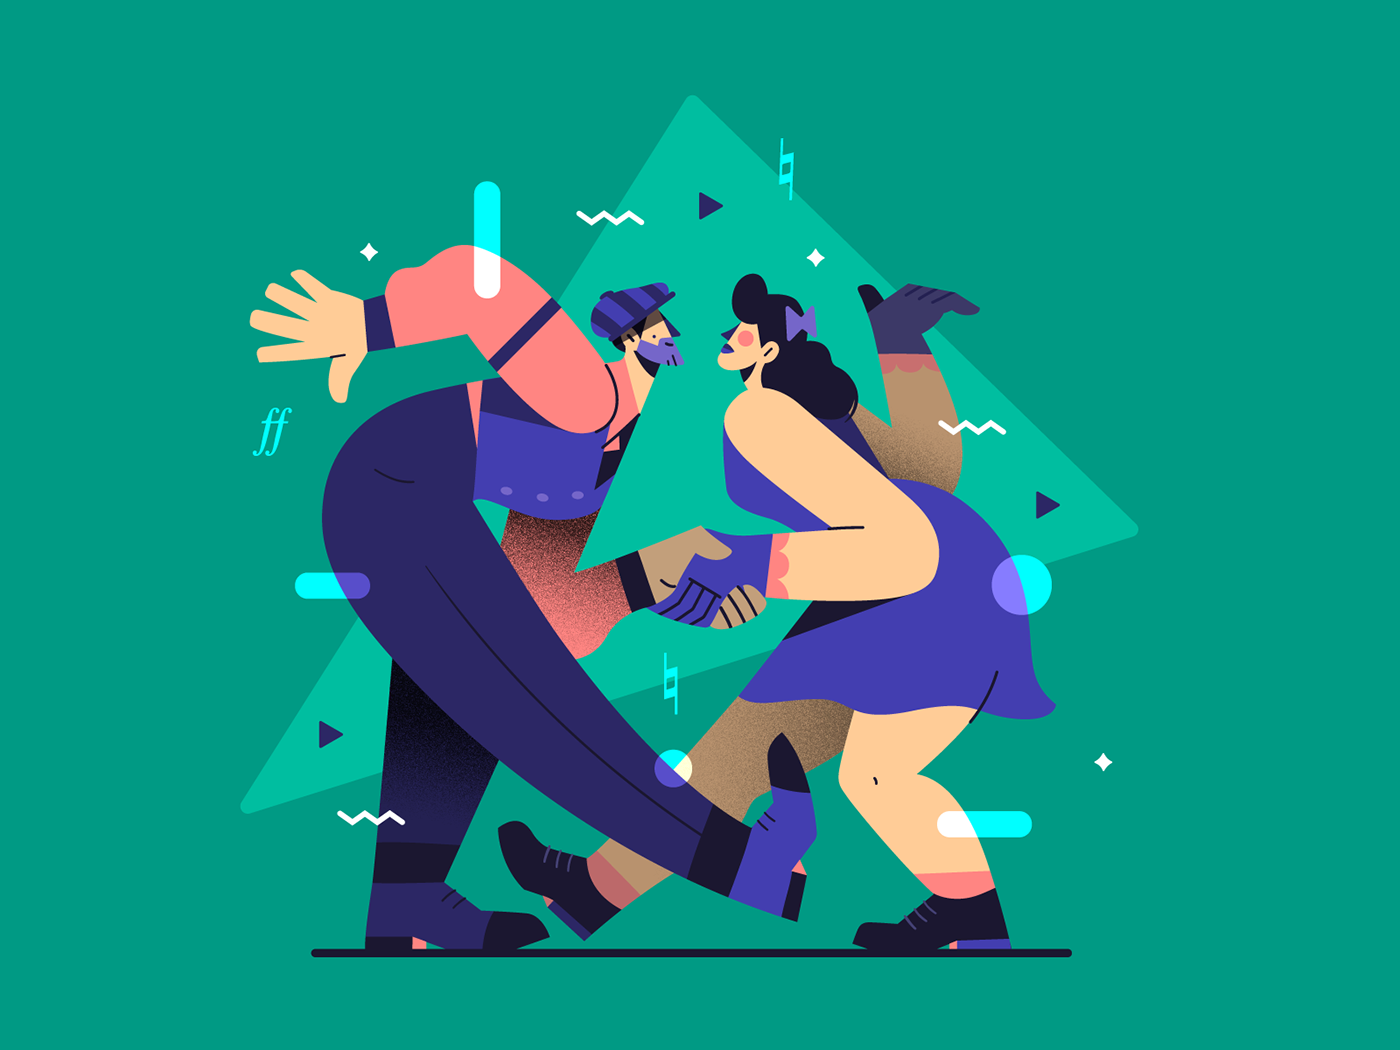 Image may contain: cartoon, illustration and christmas tree